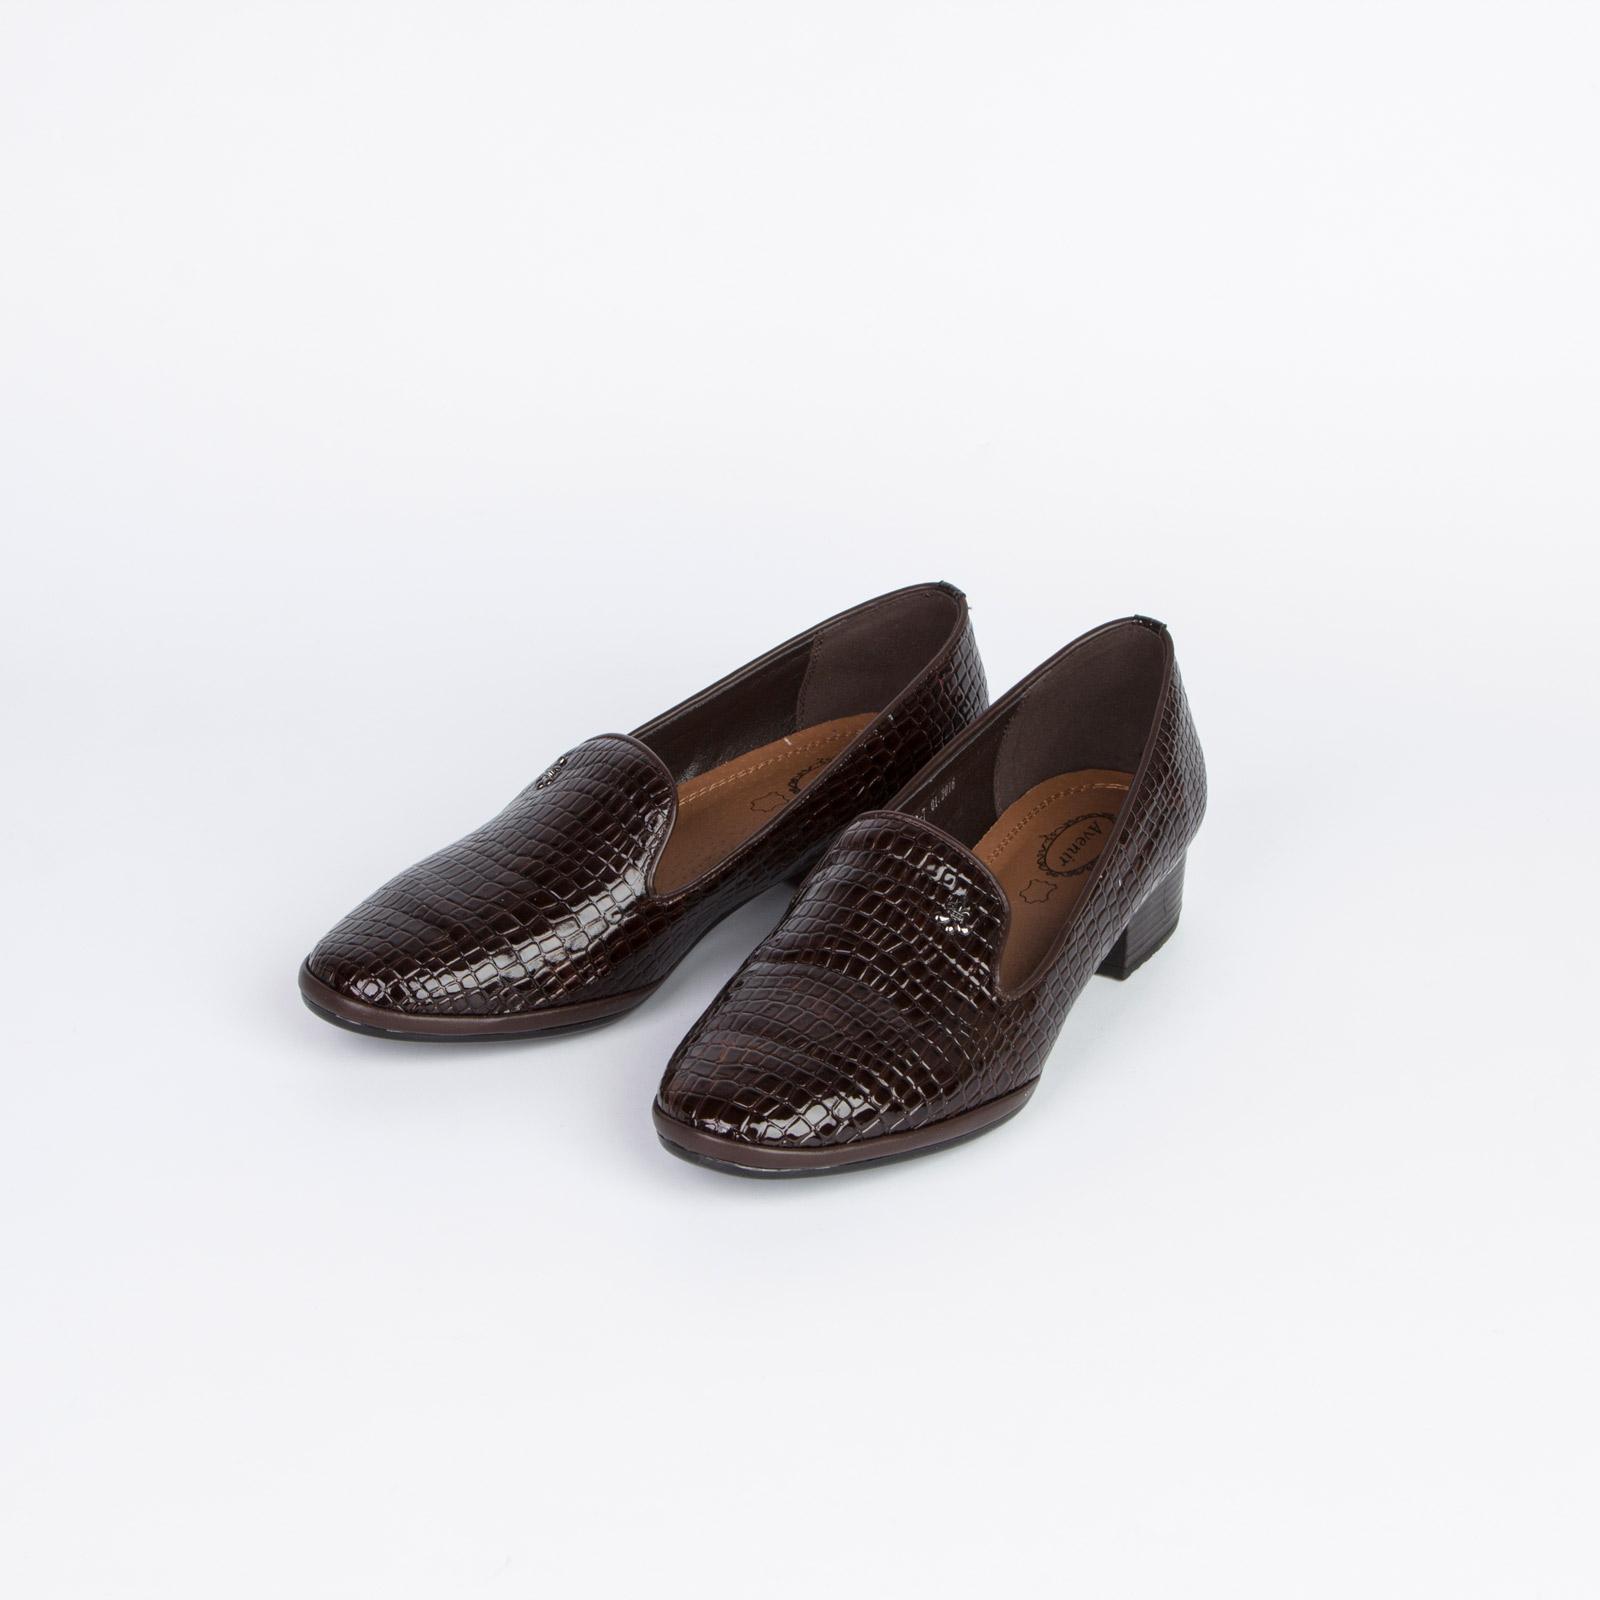 Туфли женские с тиснением под рептилию на широком каблуке